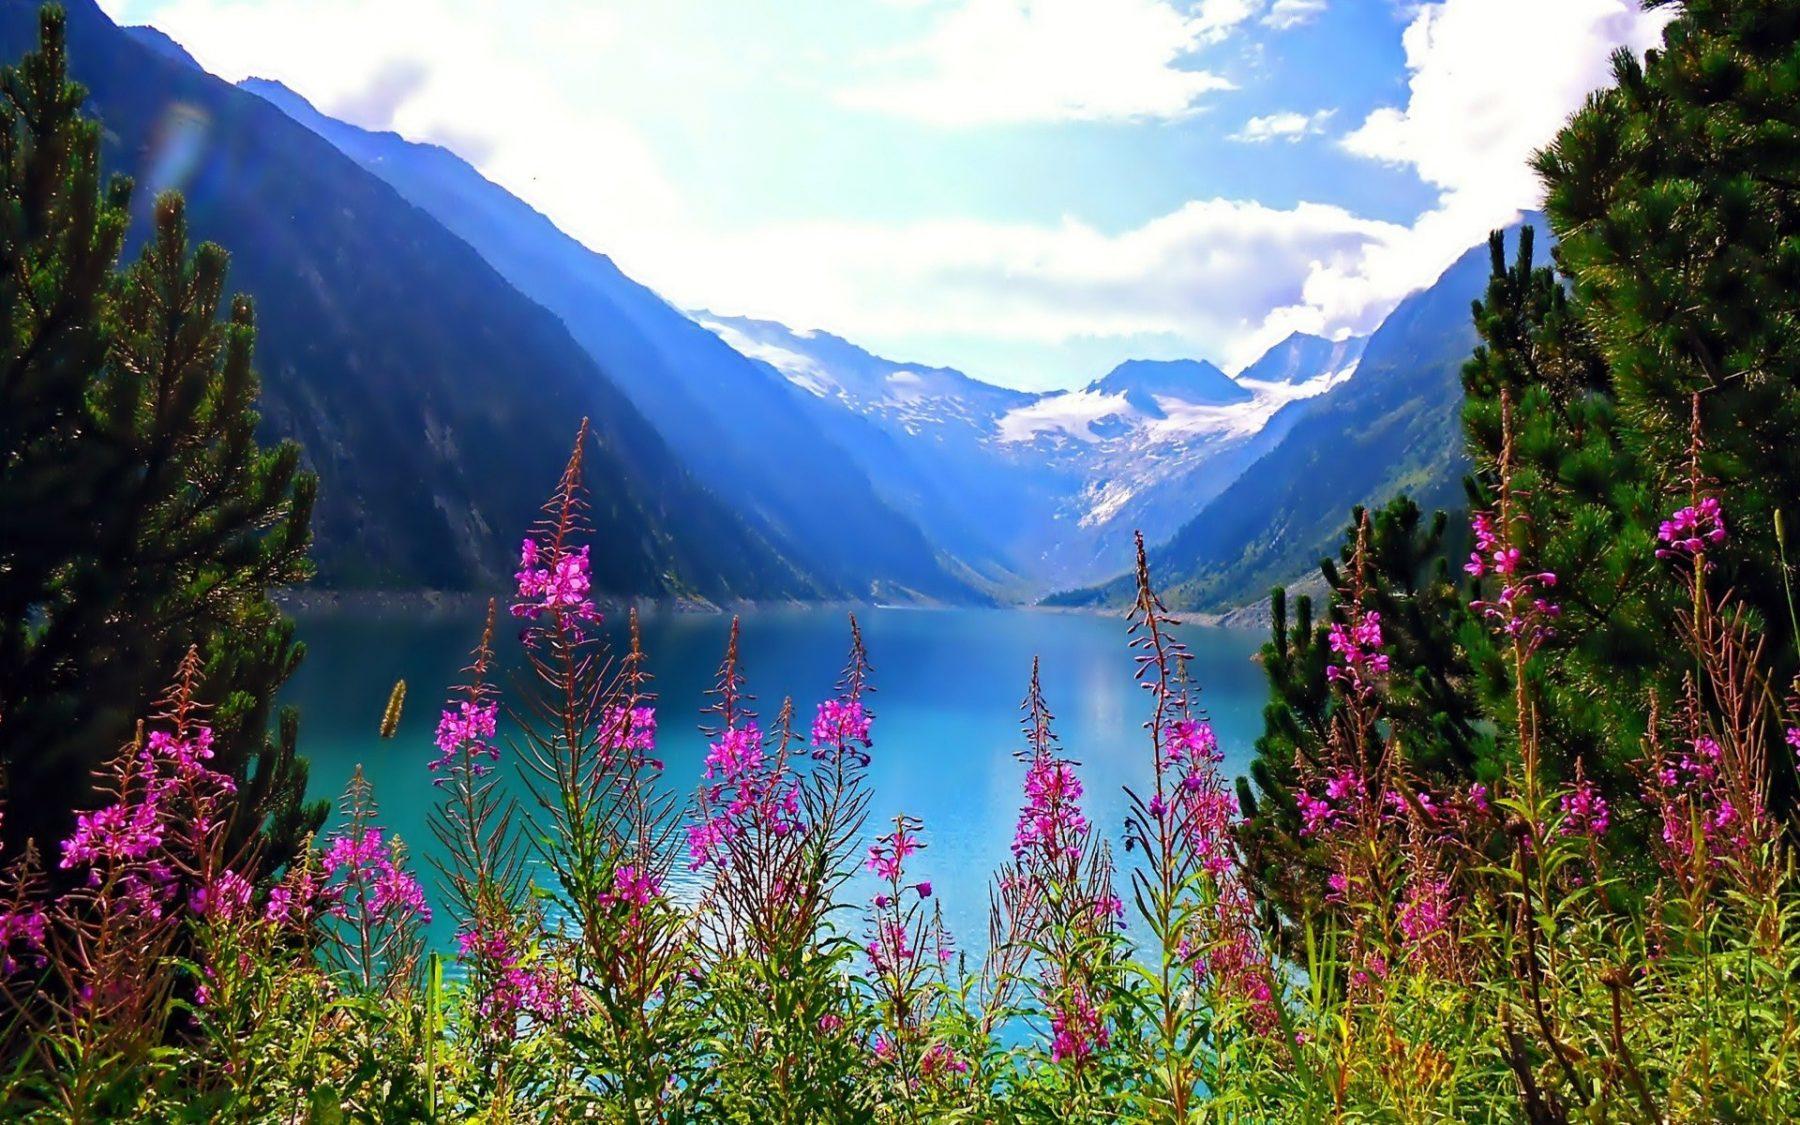 Alpine Lake with mountain view